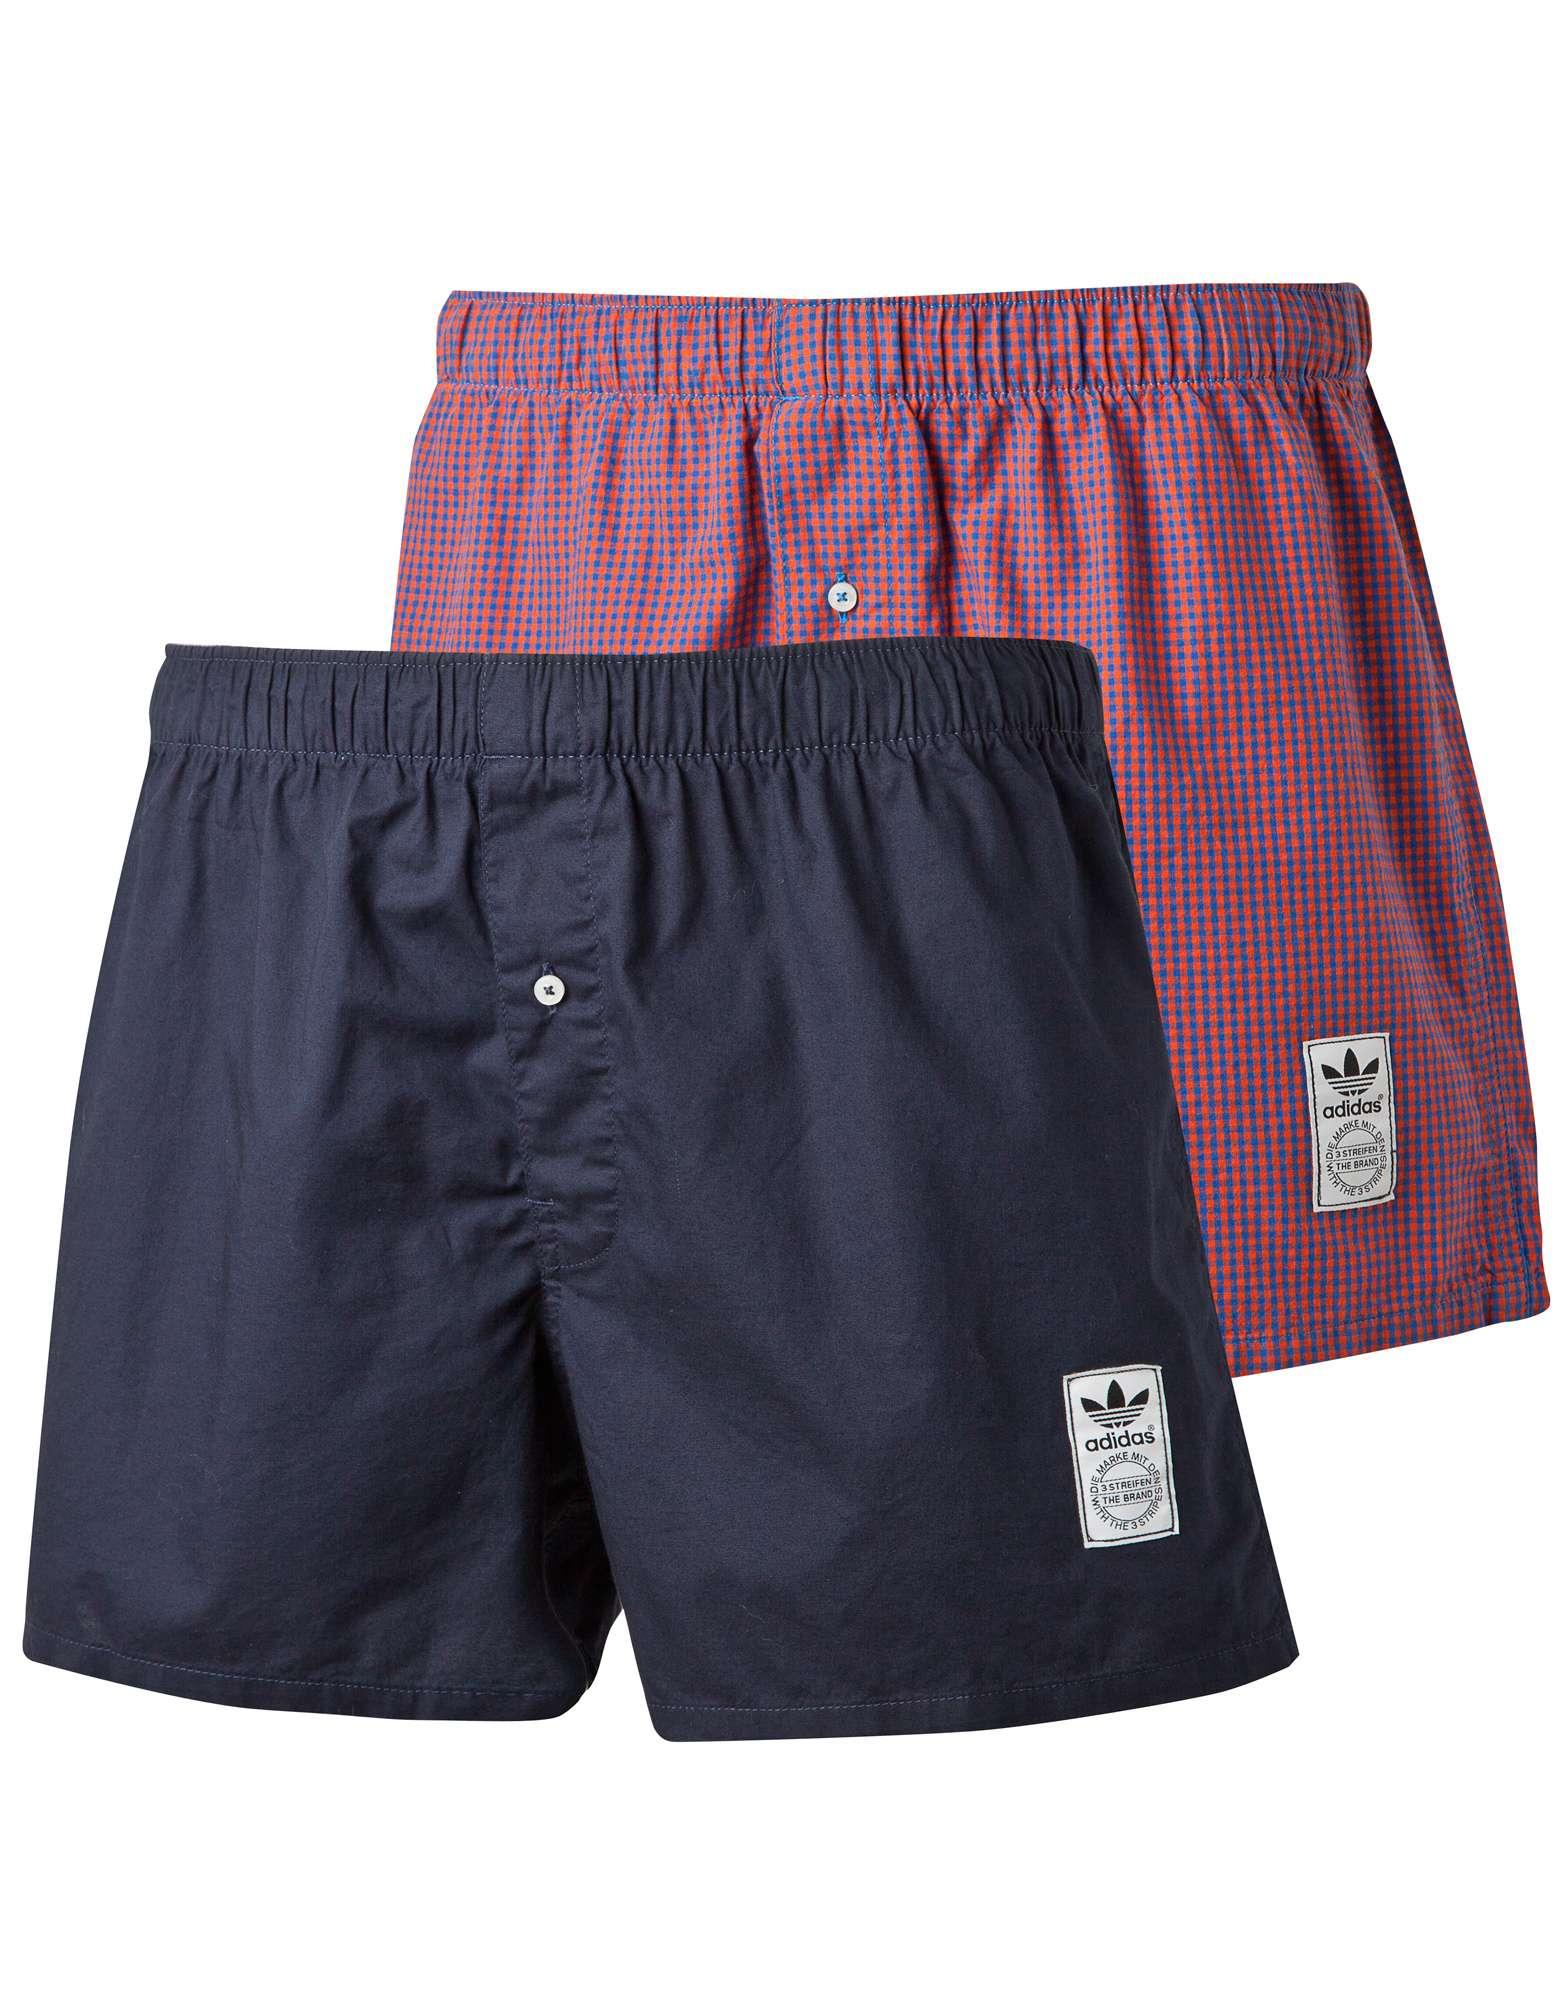 adidas Originals 2 Pack Boxer Shorts